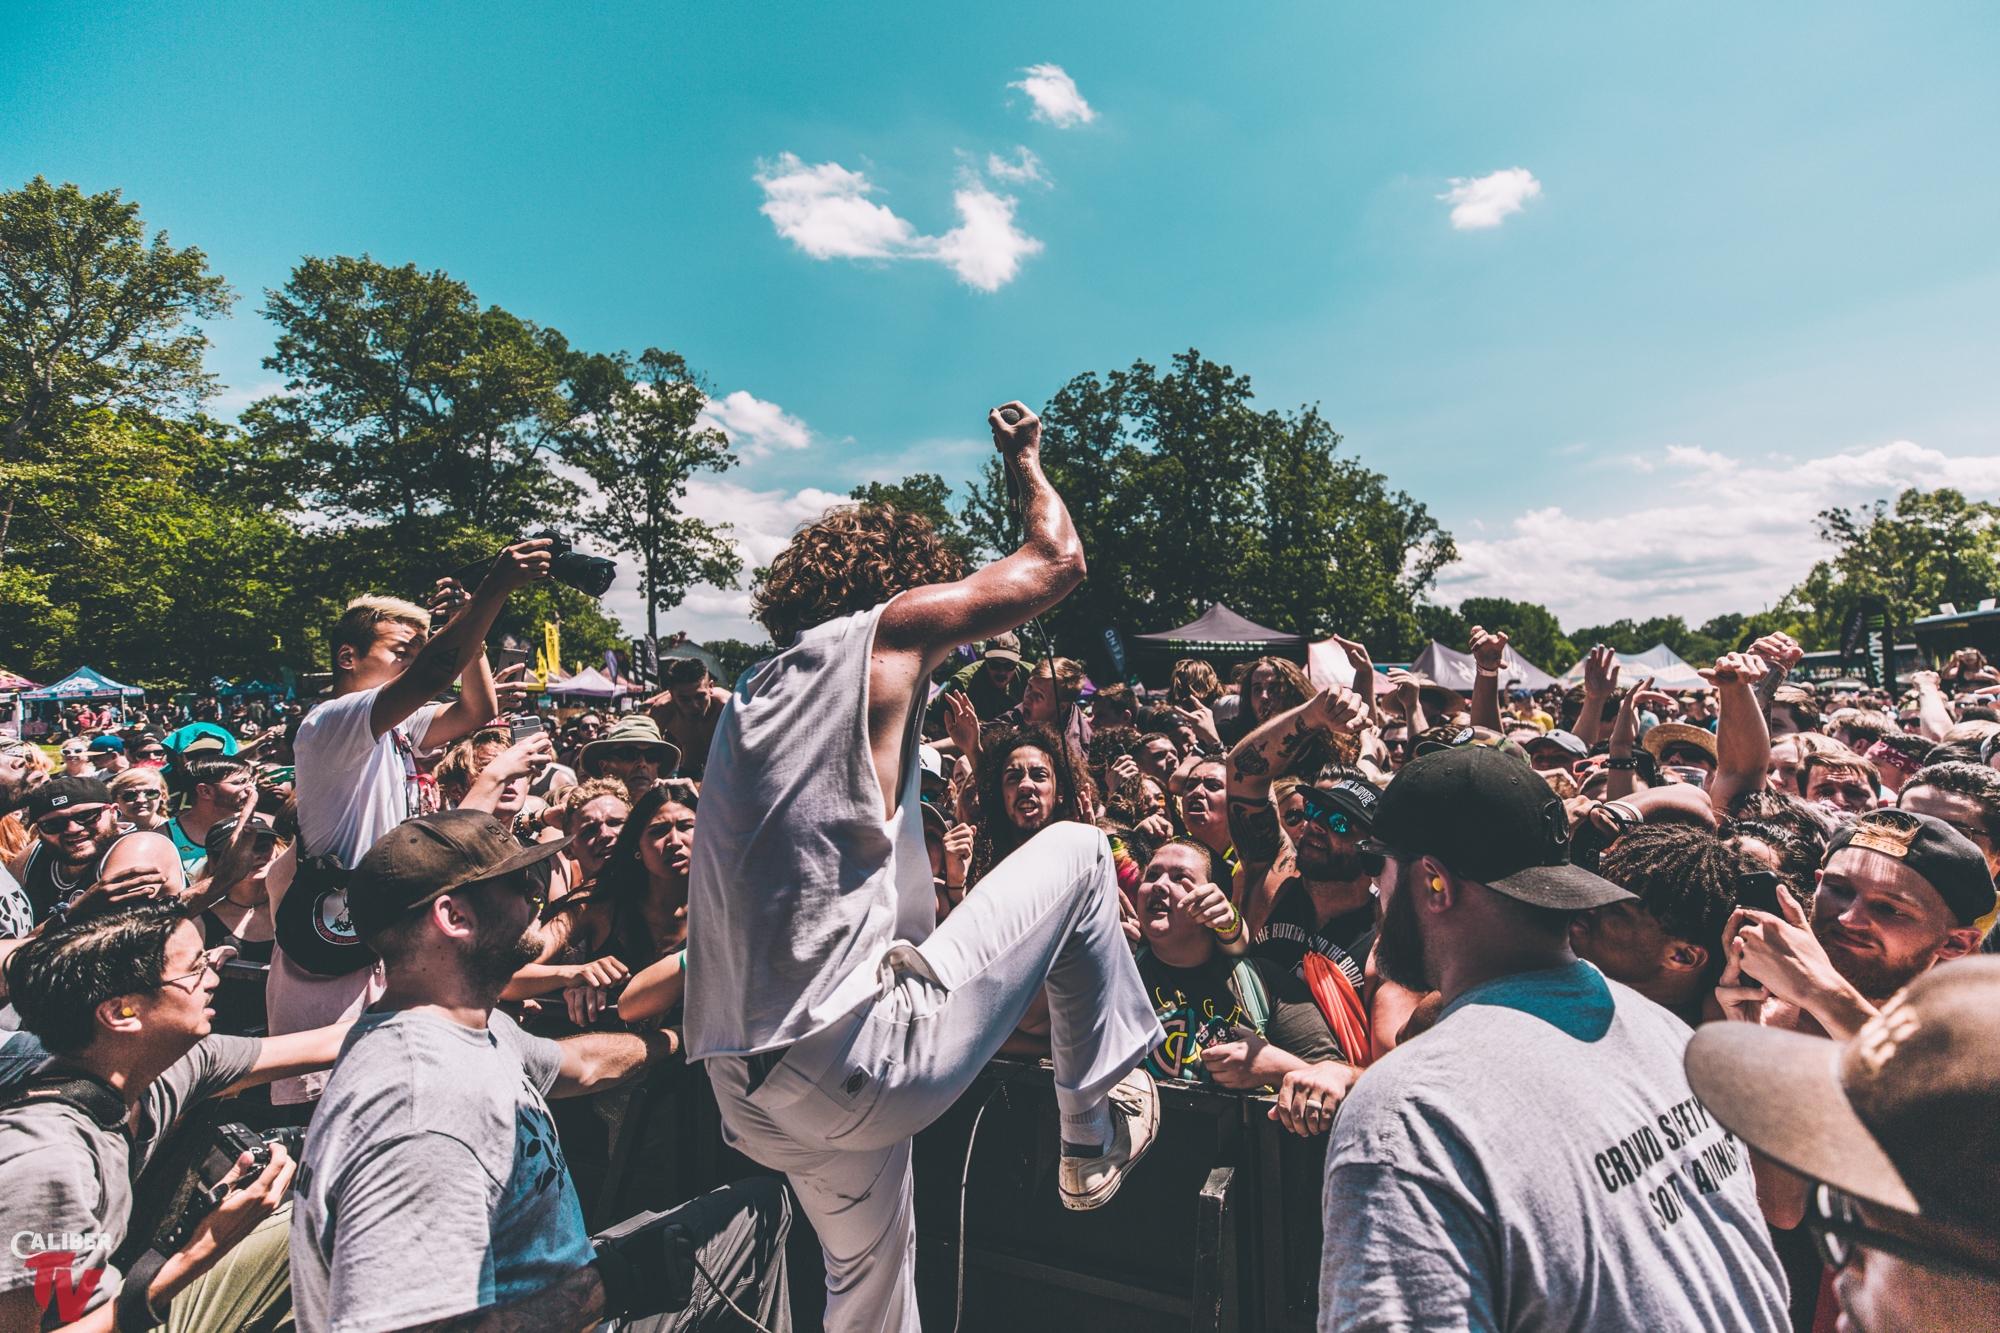 Vans Warped Tour: The Final Run (Part 2) – Columbia, MD – 7.29.18